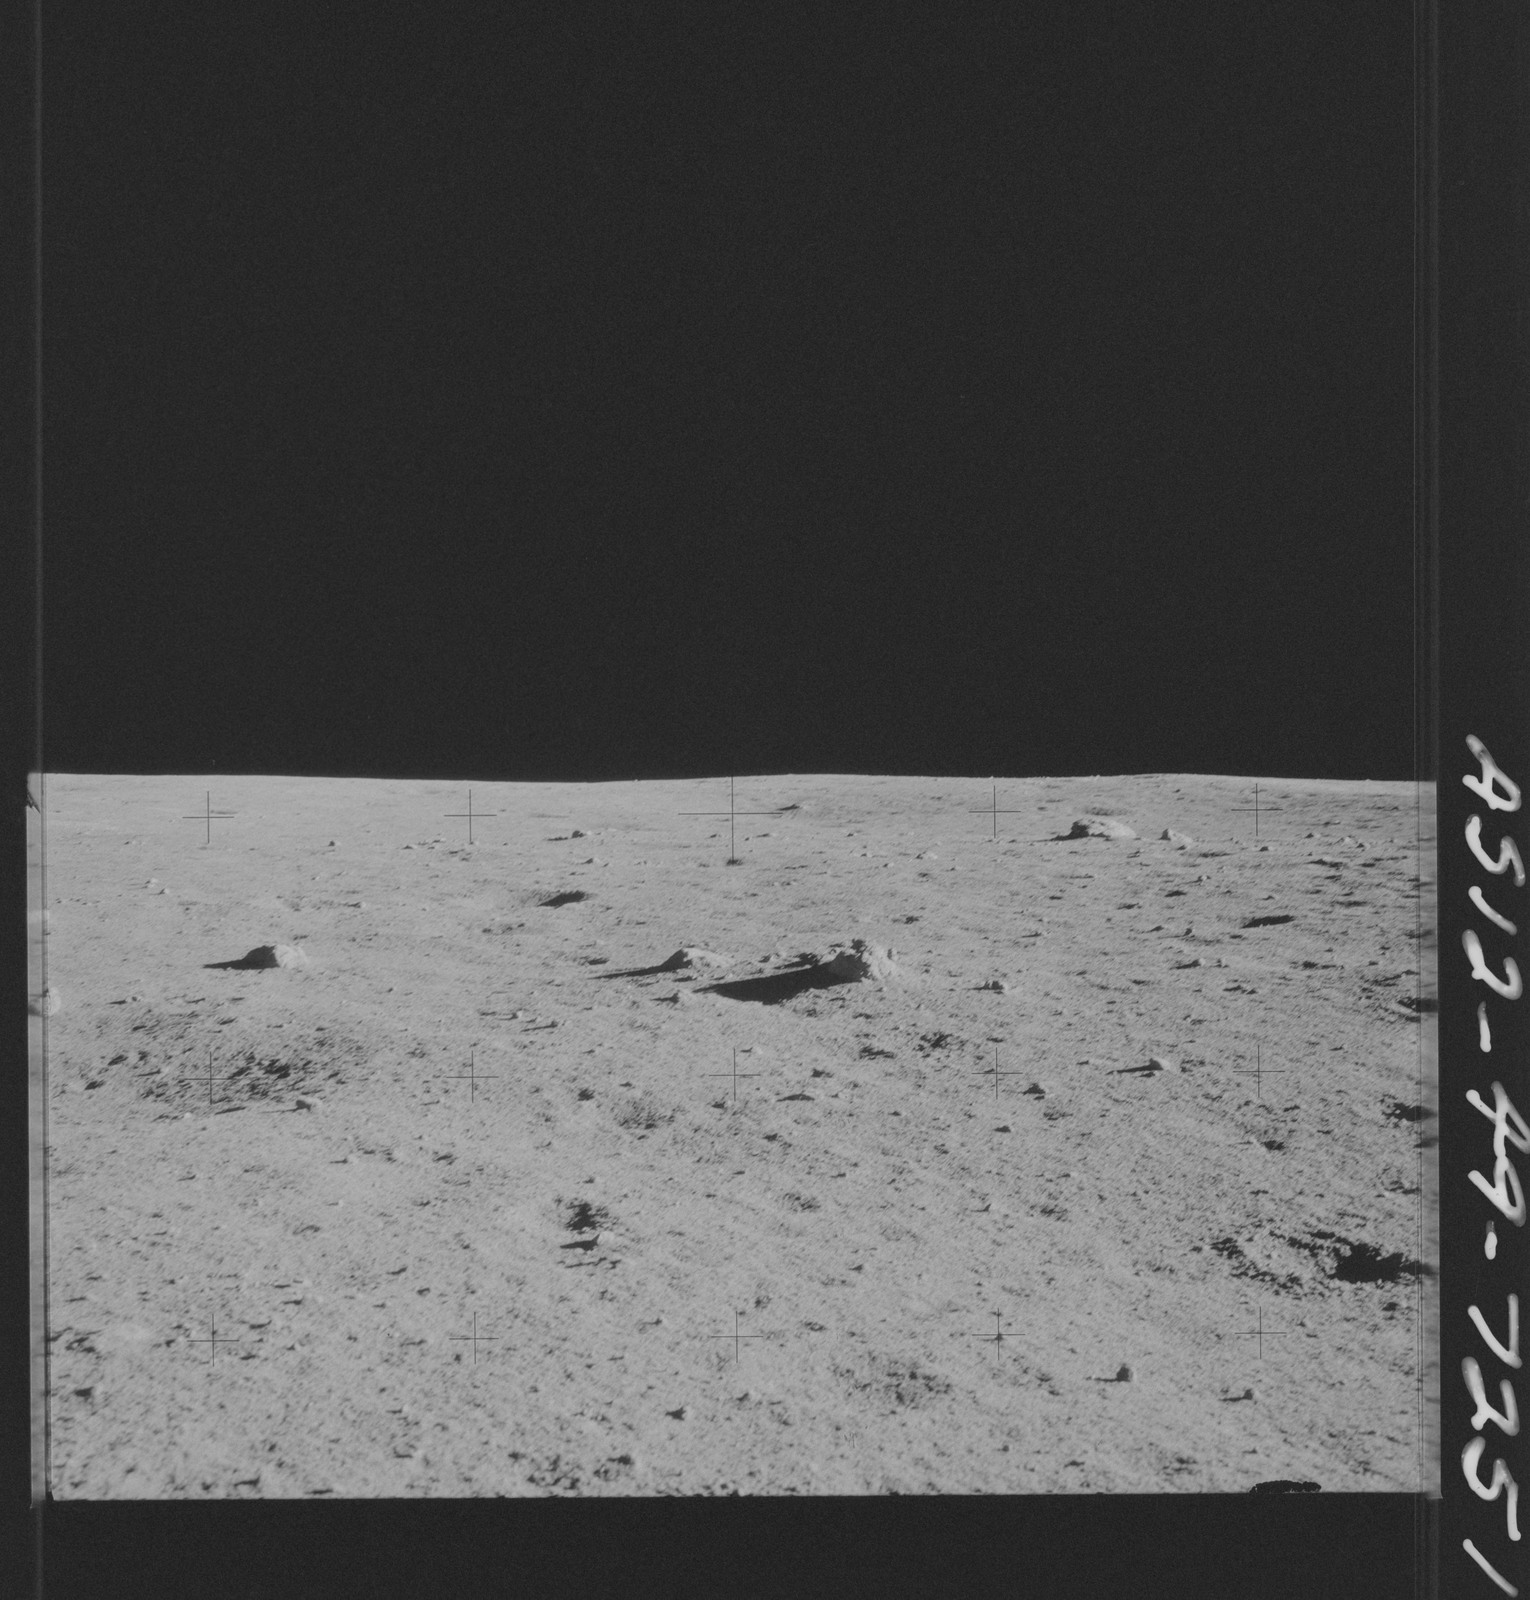 AS12-49-7251 - Apollo 12 - Apollo 12 Mission image  - View of the Lunar terrain